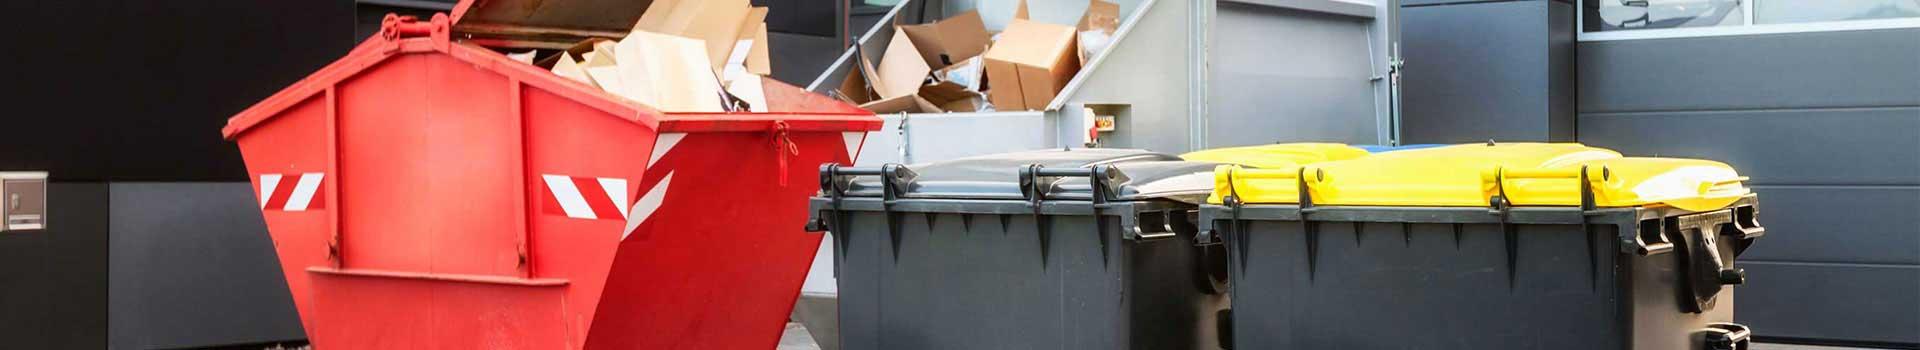 Trade Waste Management Services